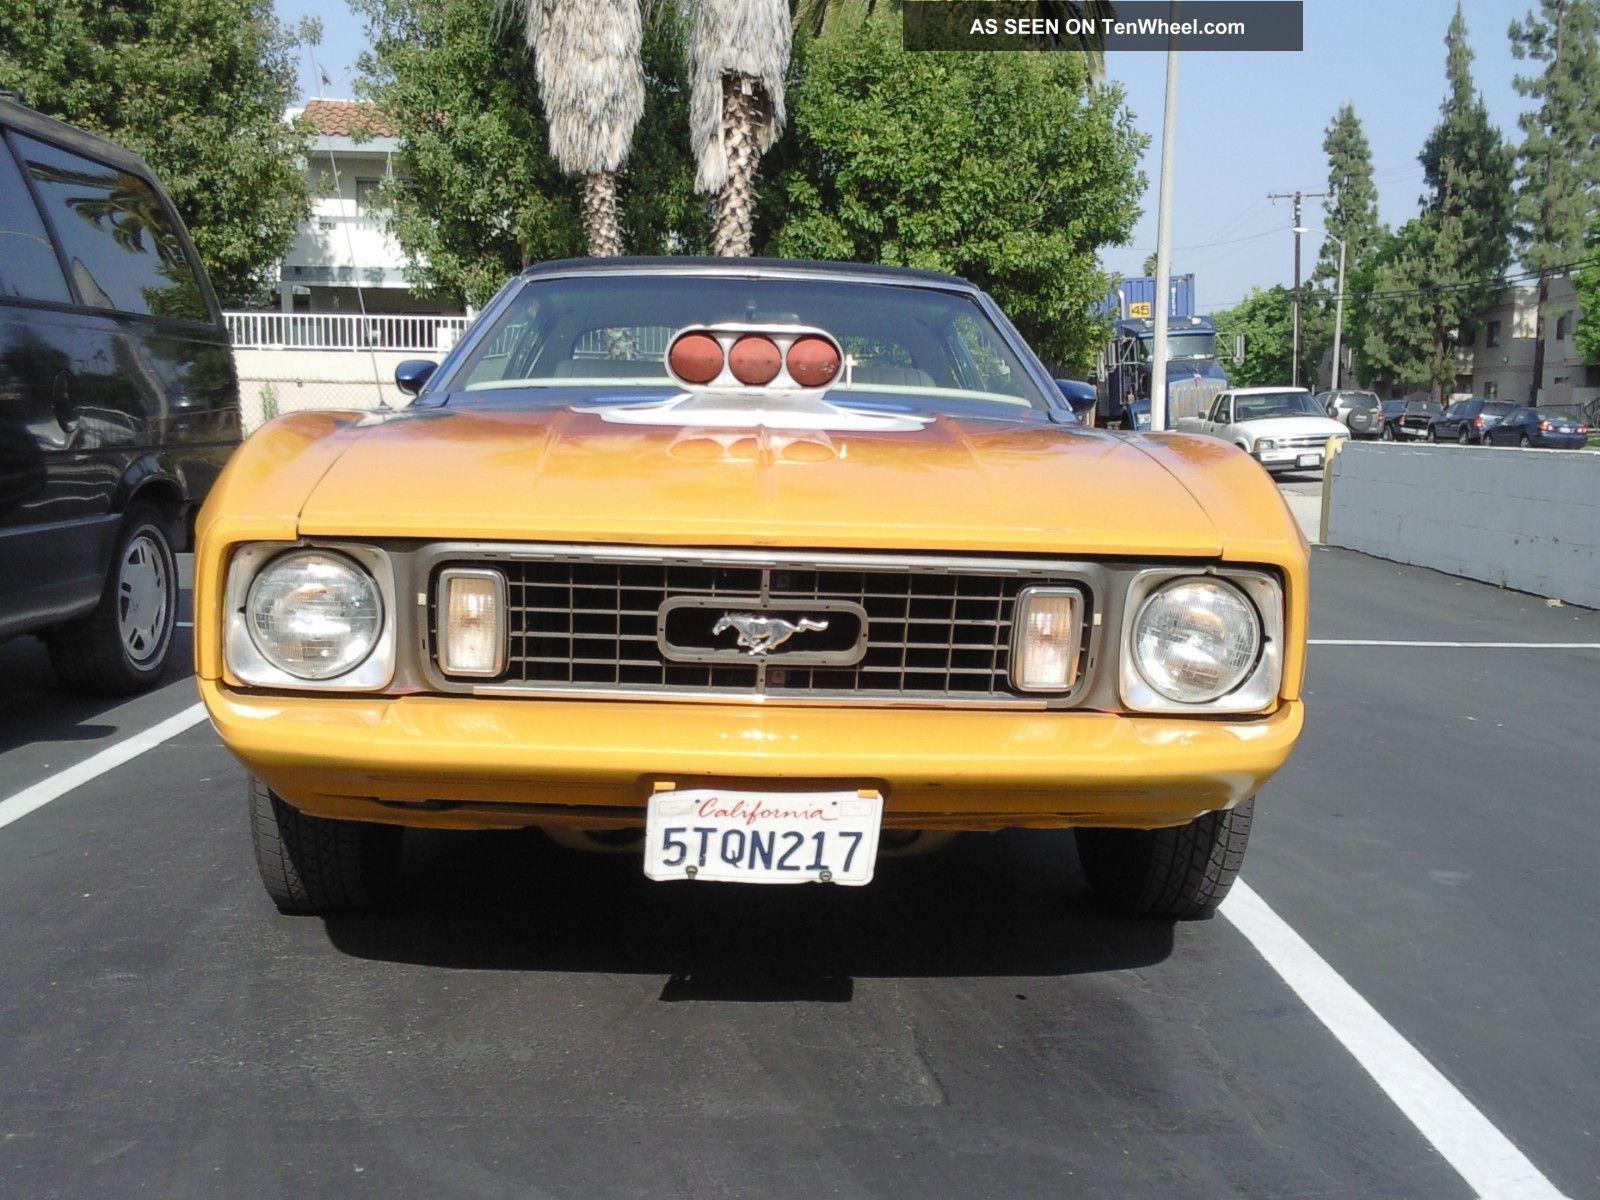 1973 Ford Mustang Mach 1 Grande (rebuilt & Modified) Mustang photo